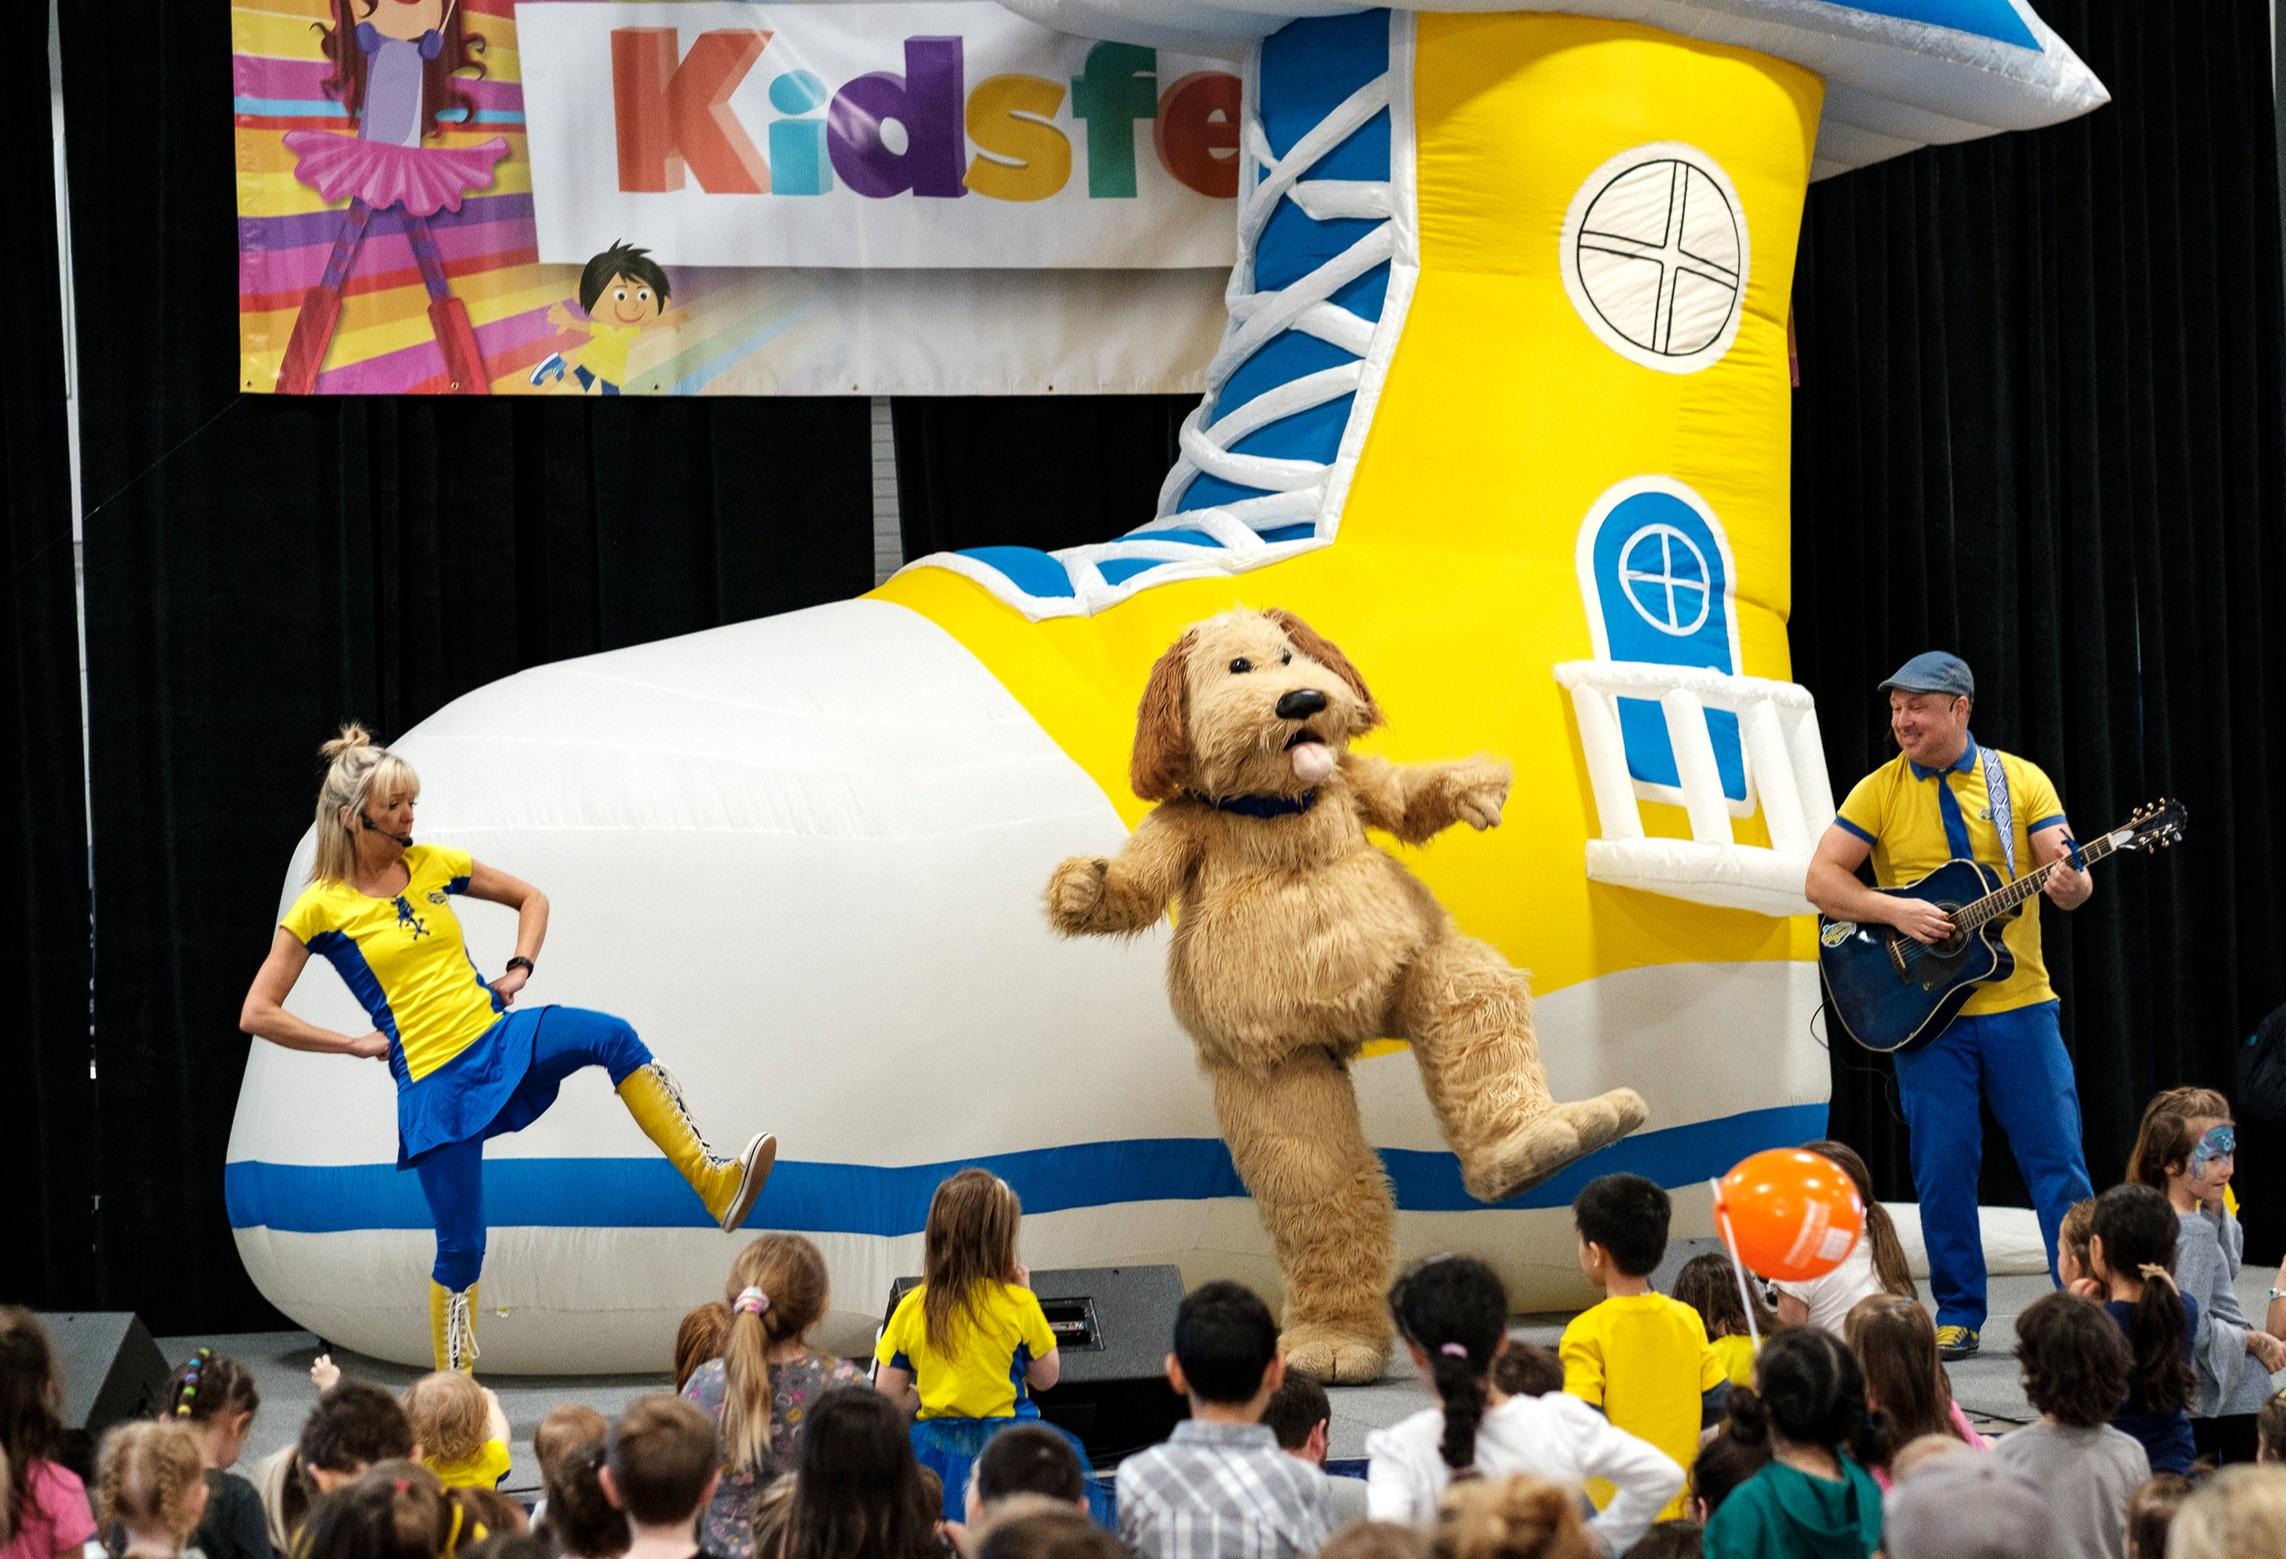 Kidsfest-15.jpg